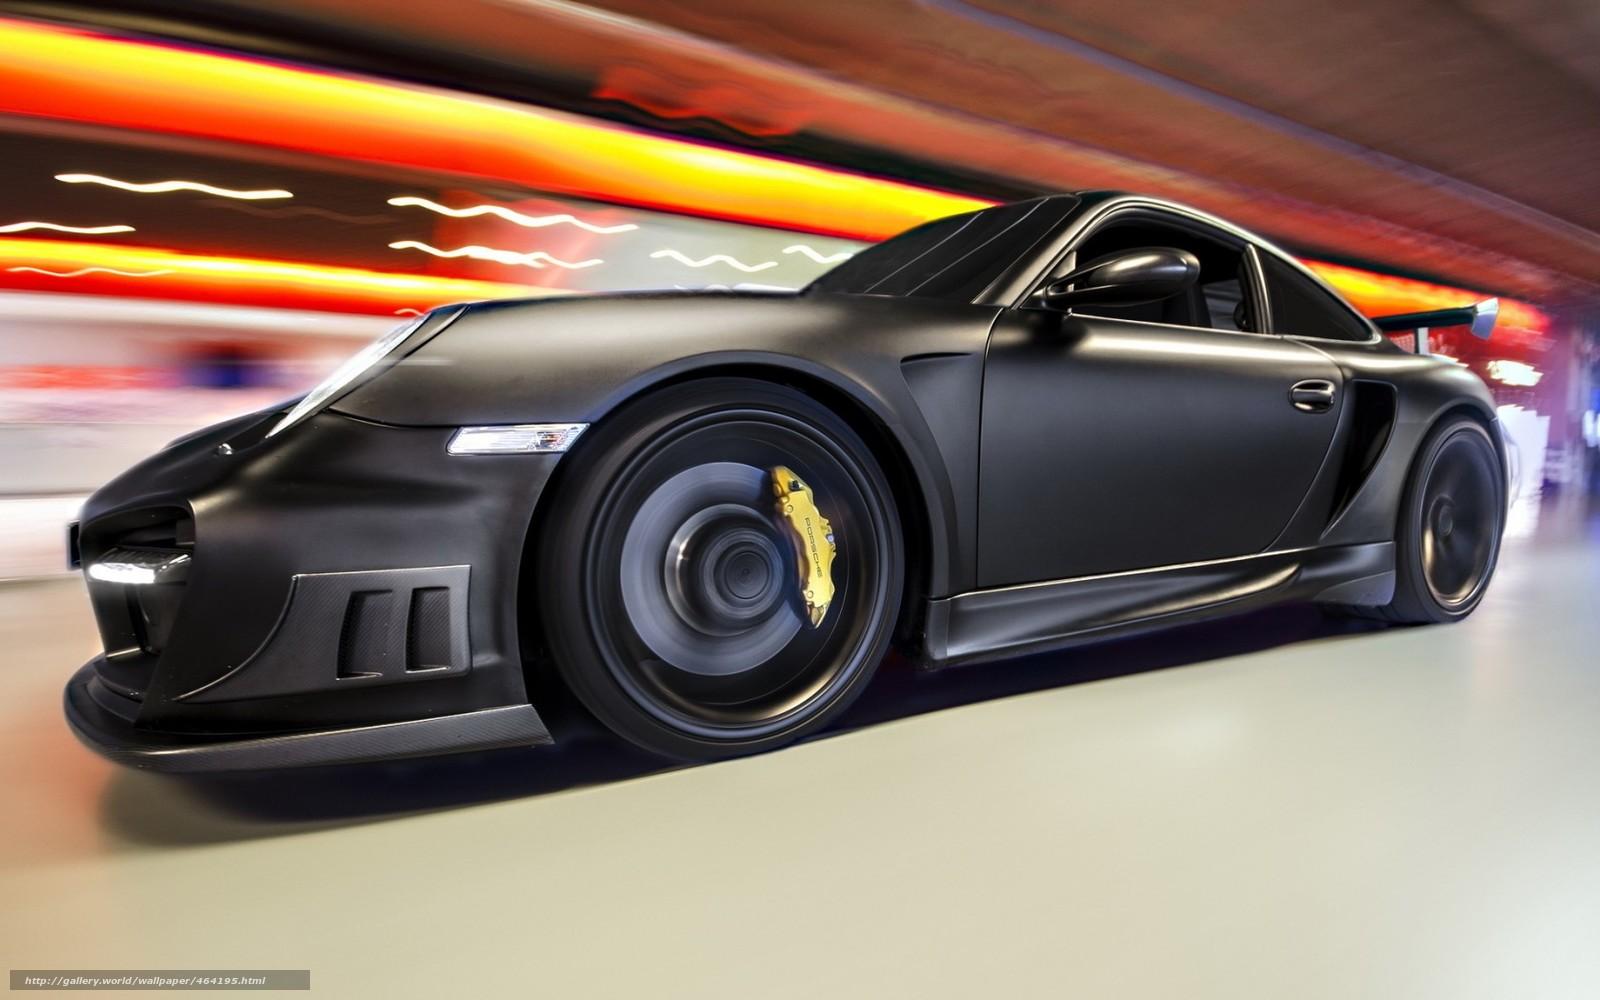 Download Wallpaper Black Supercar Tuning Rate Free